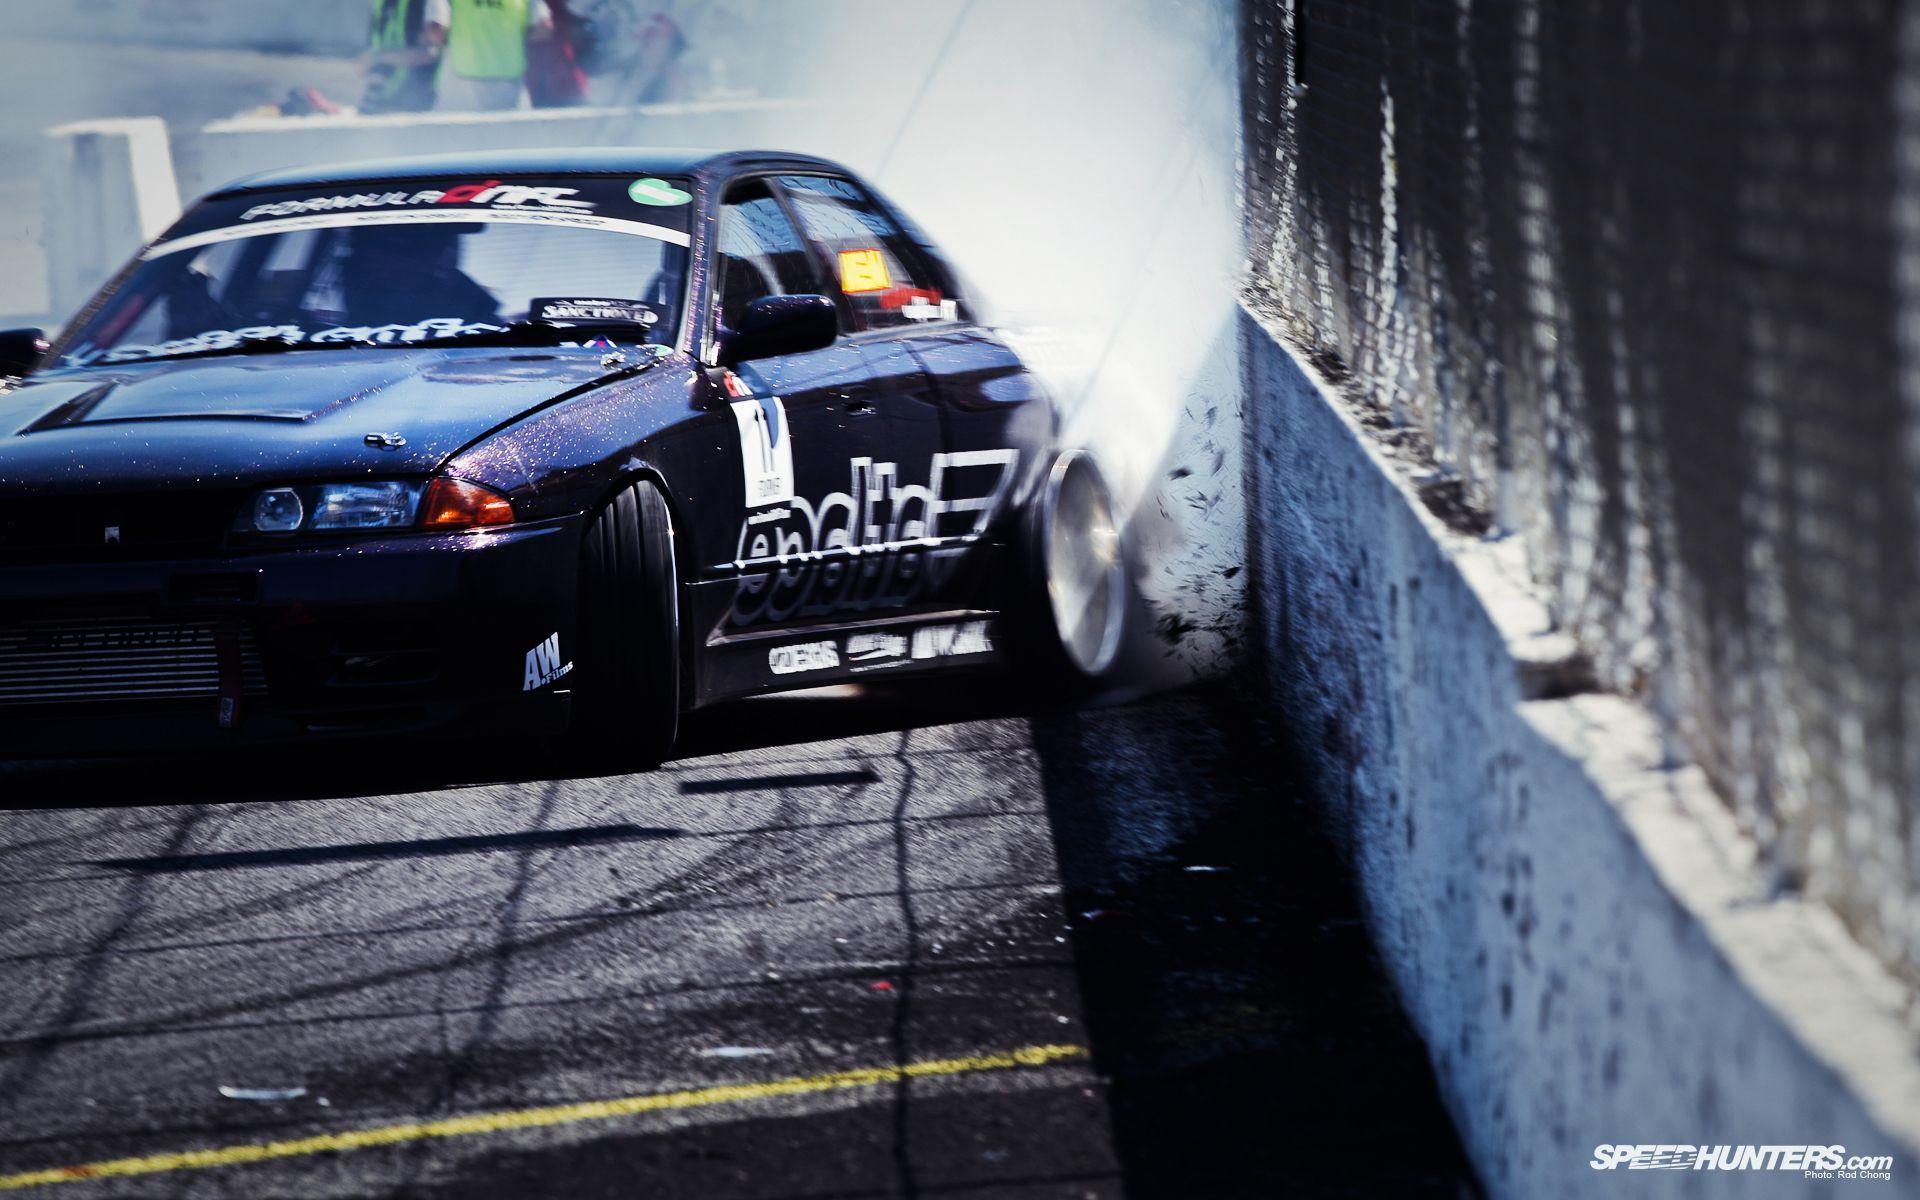 Fatlace R32 scrapin the wall | Drifting cars, Drifting ...